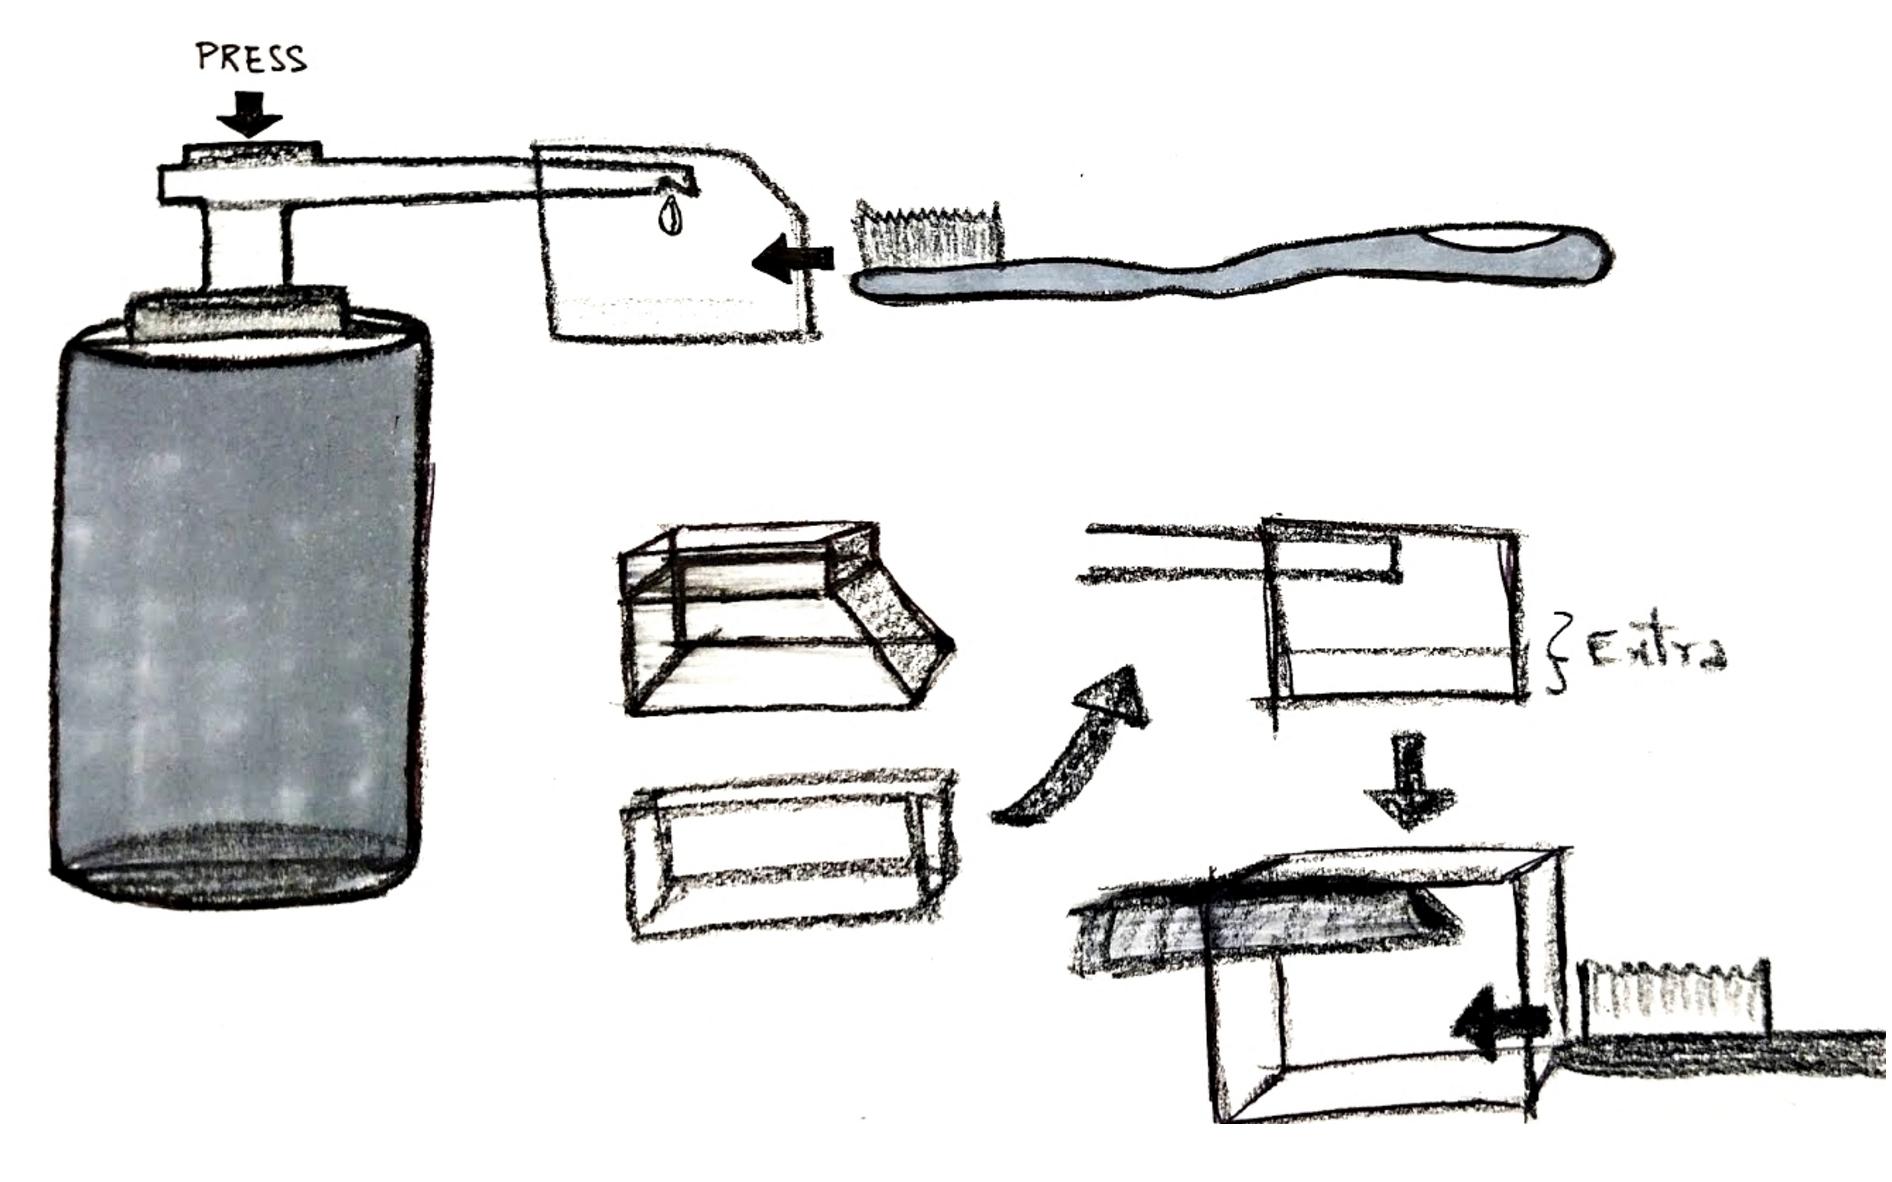 Alternate Toothpaste dispenser design sketches